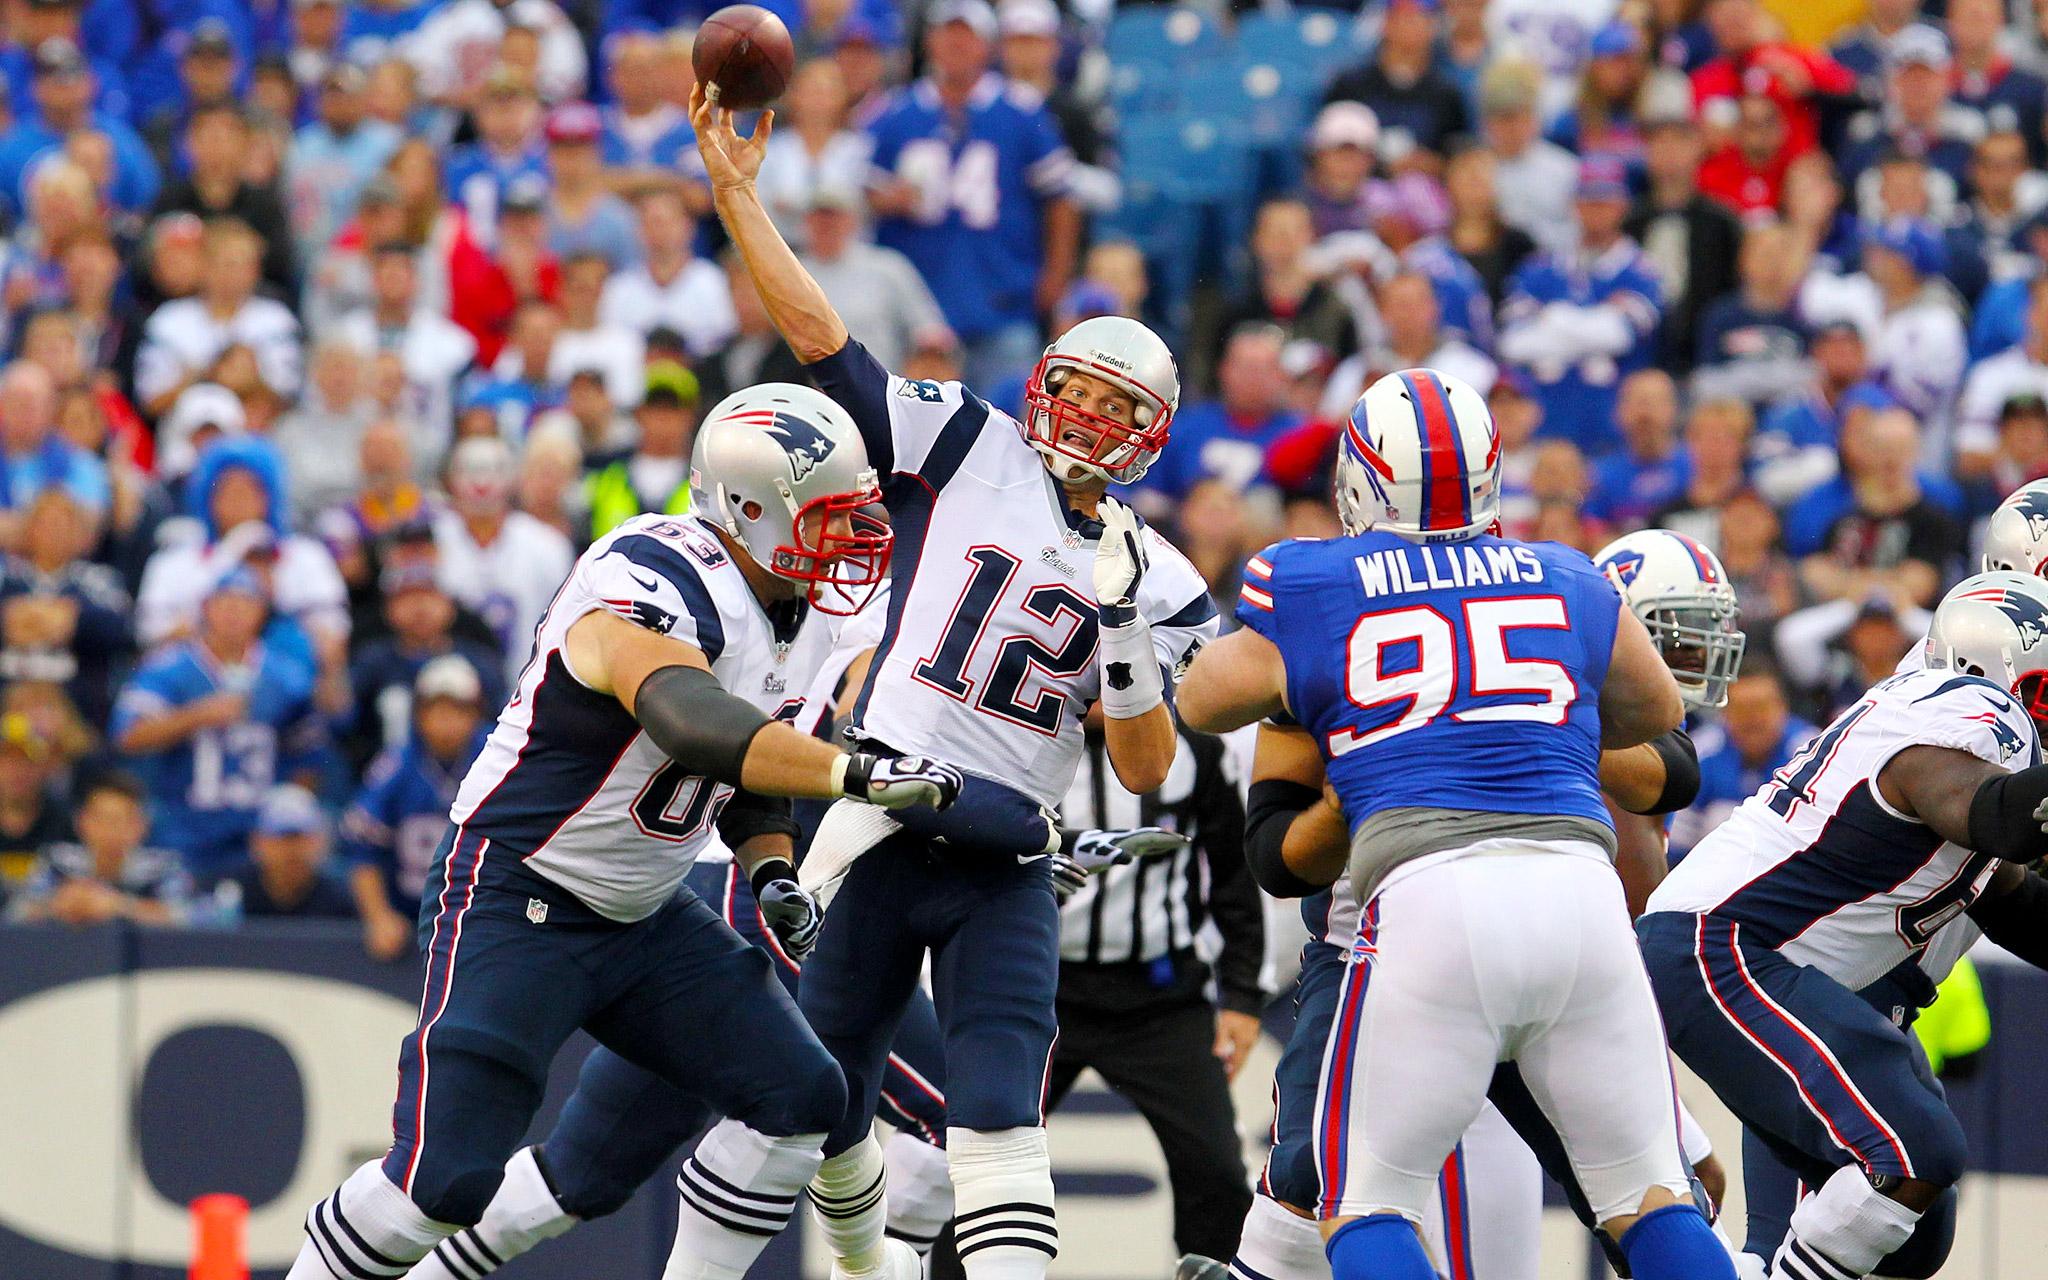 Week 4: Patriots 52, Bills 28